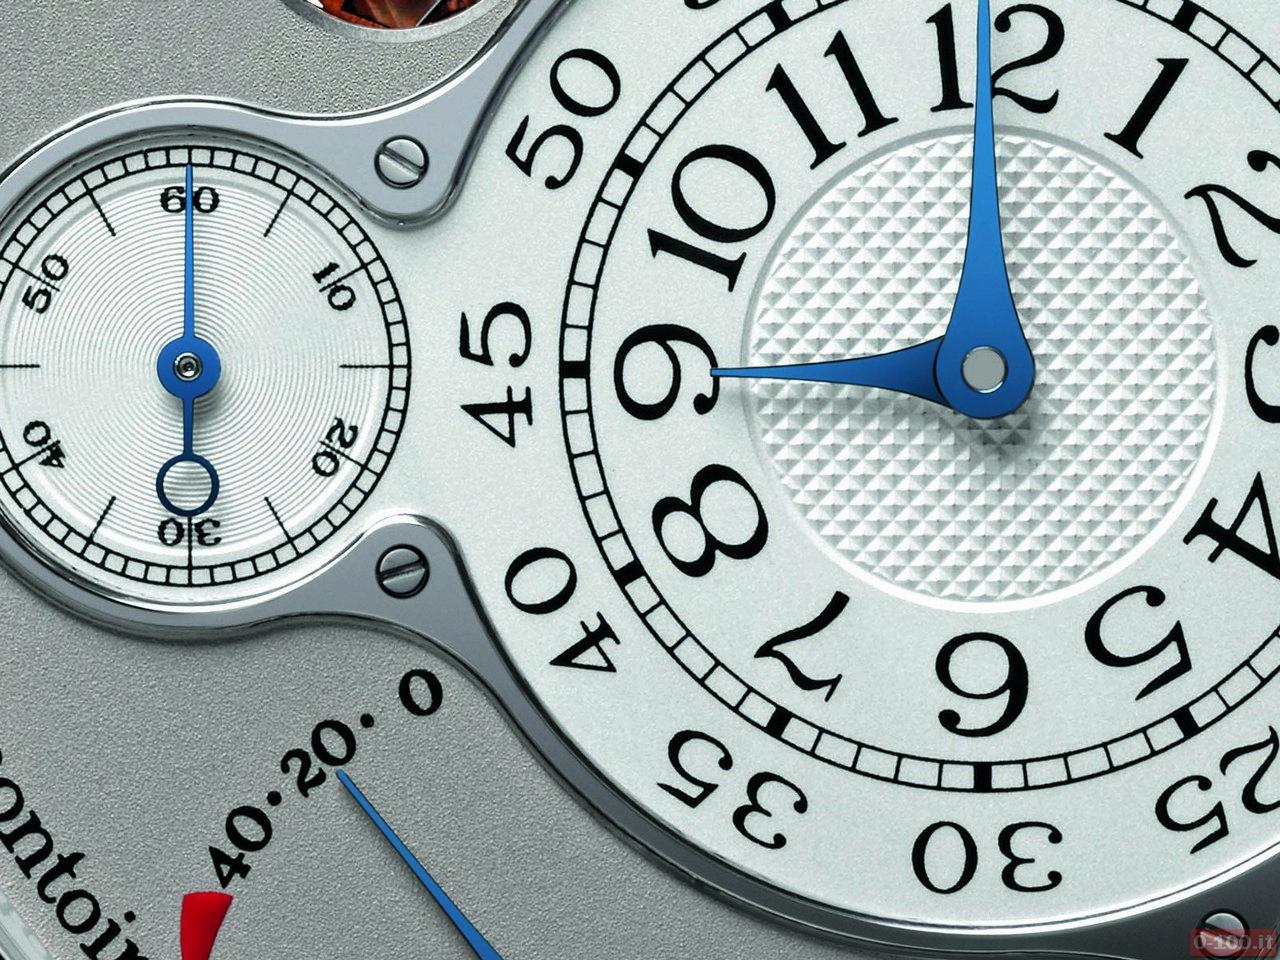 f-p-journe-chronometre-optimum-0-100_15